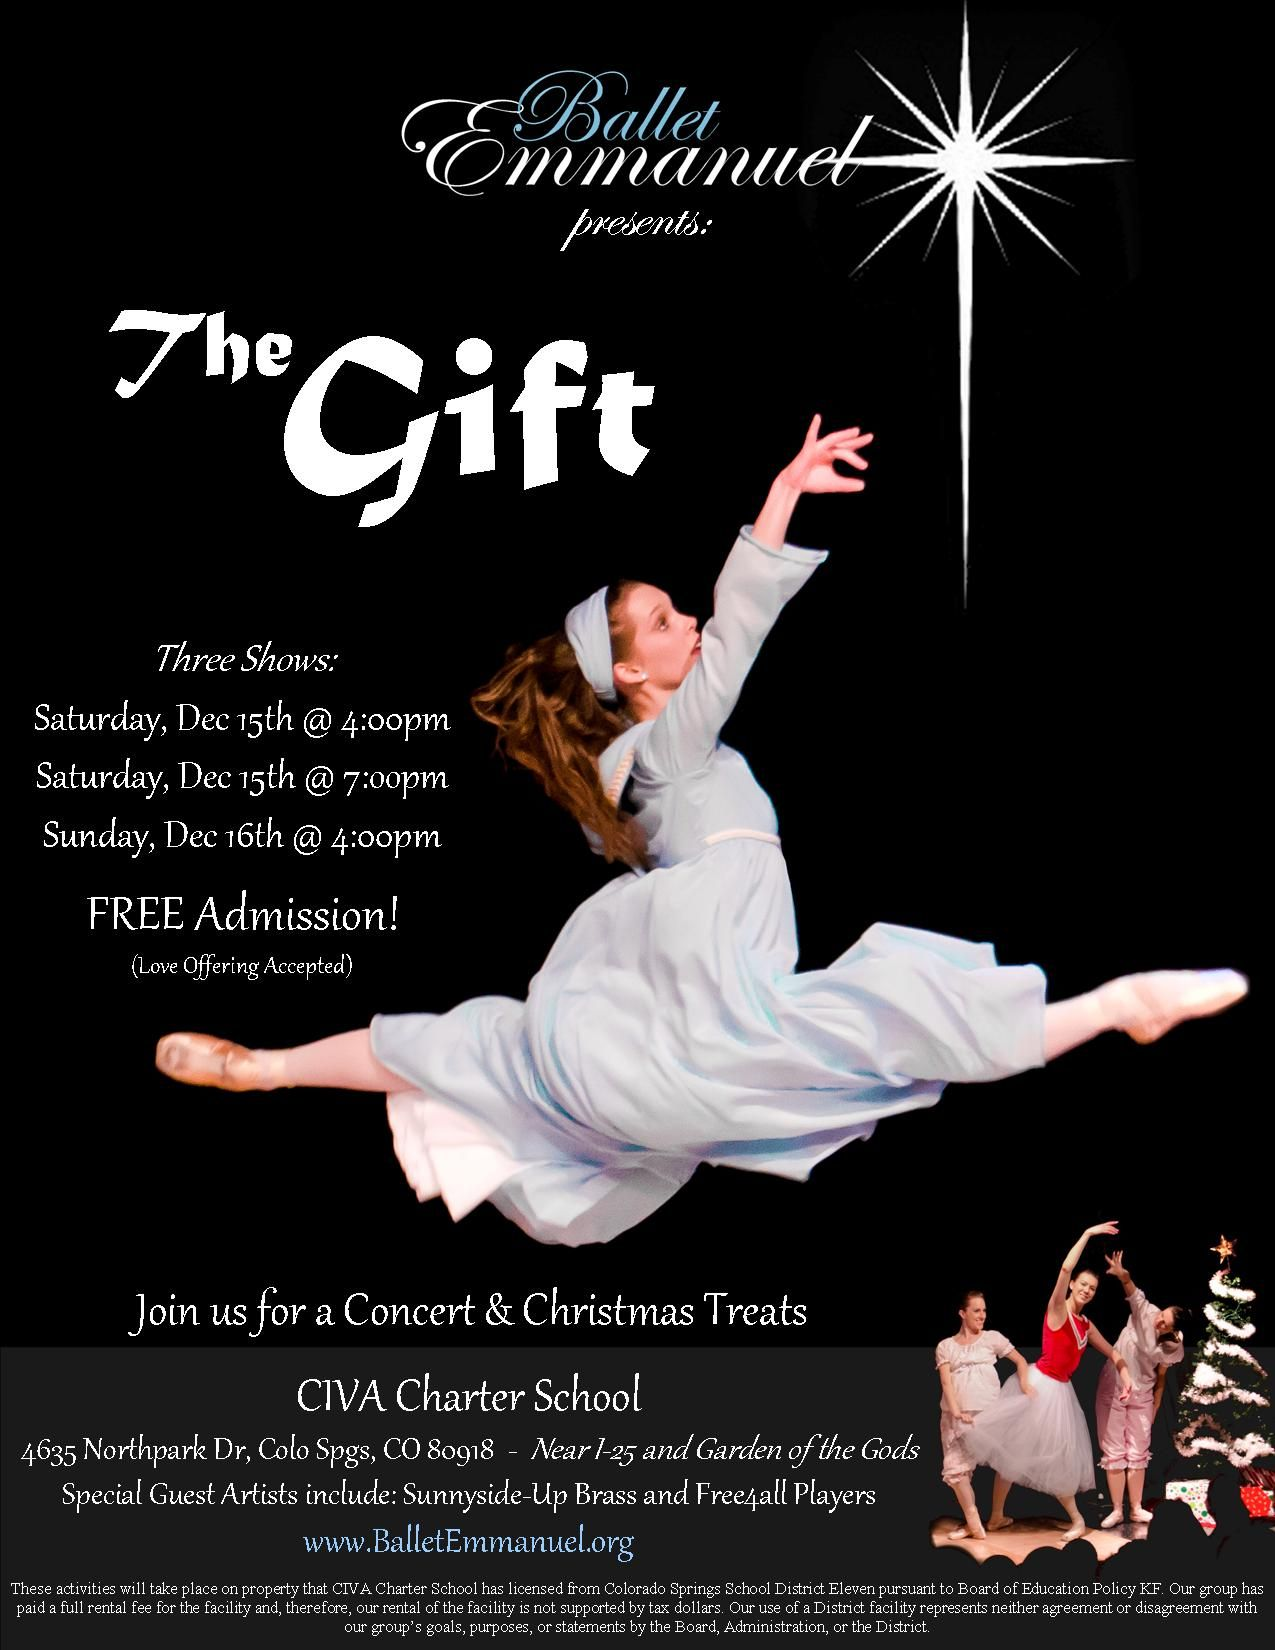 #thegift #gifts #christmas #christ #jesus #celebrate #ballet #dance #performance #jazz # ...